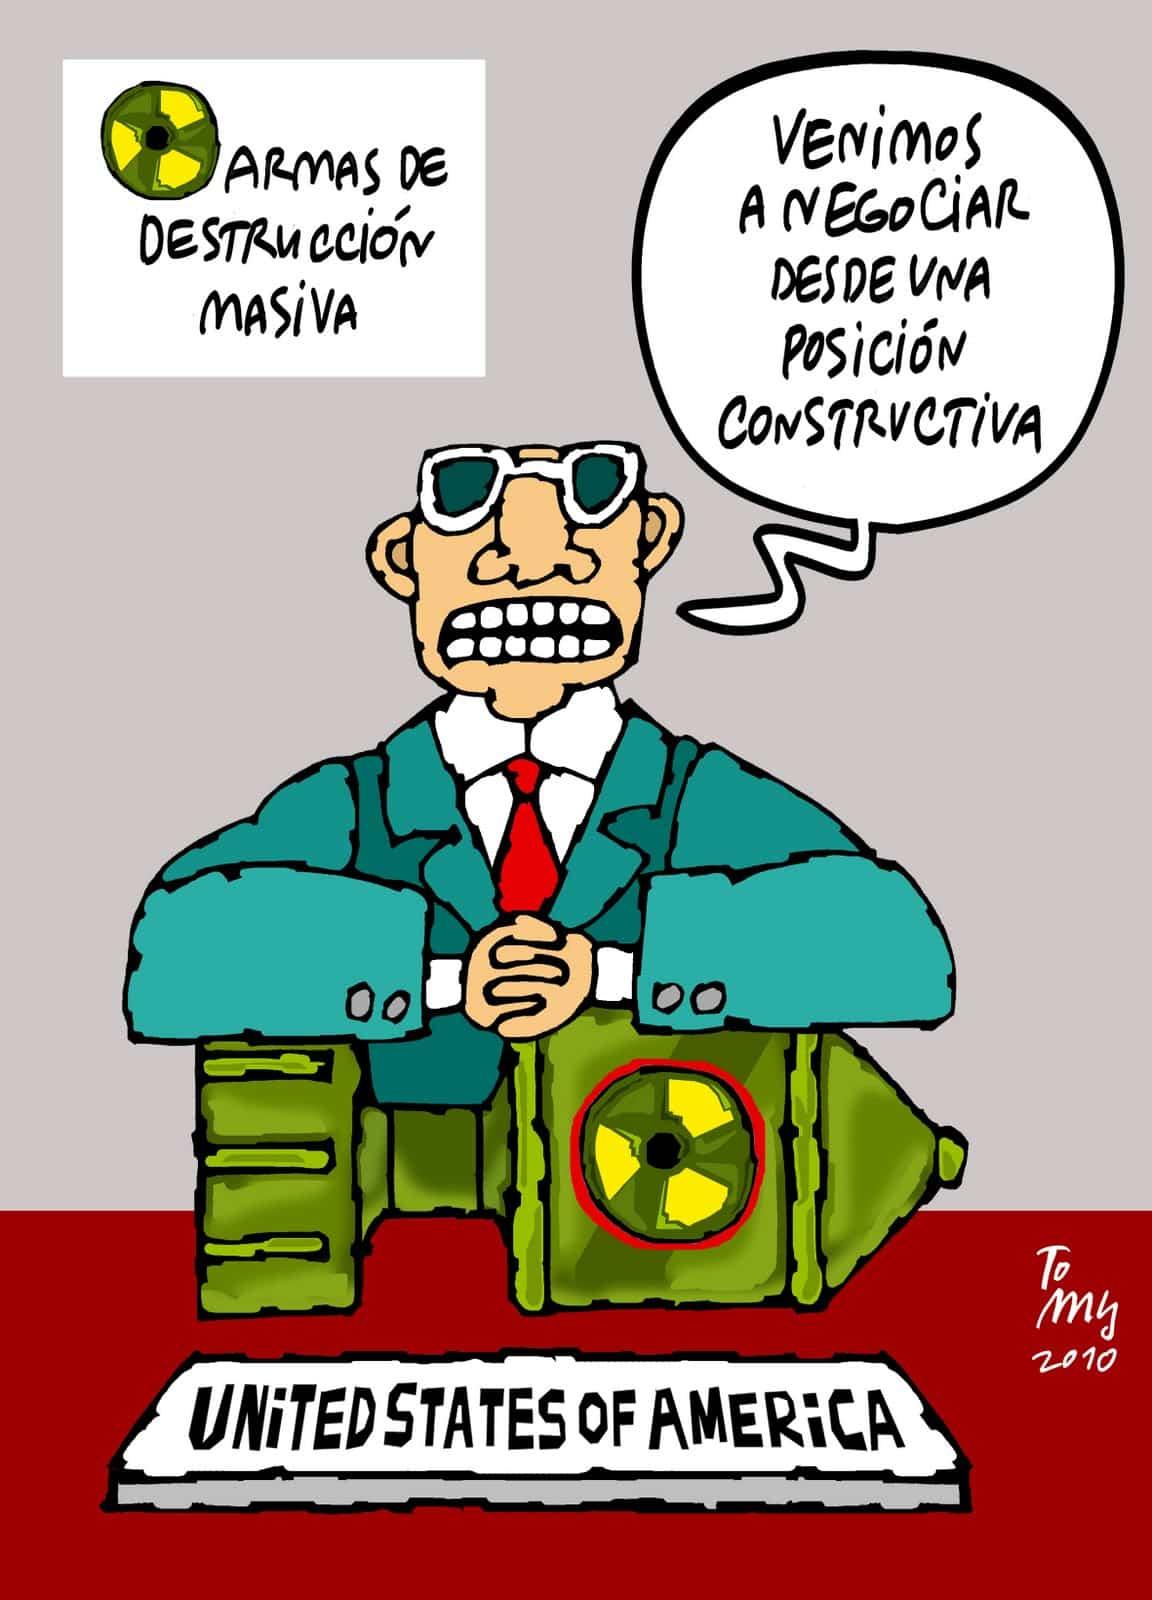 Constructive Position